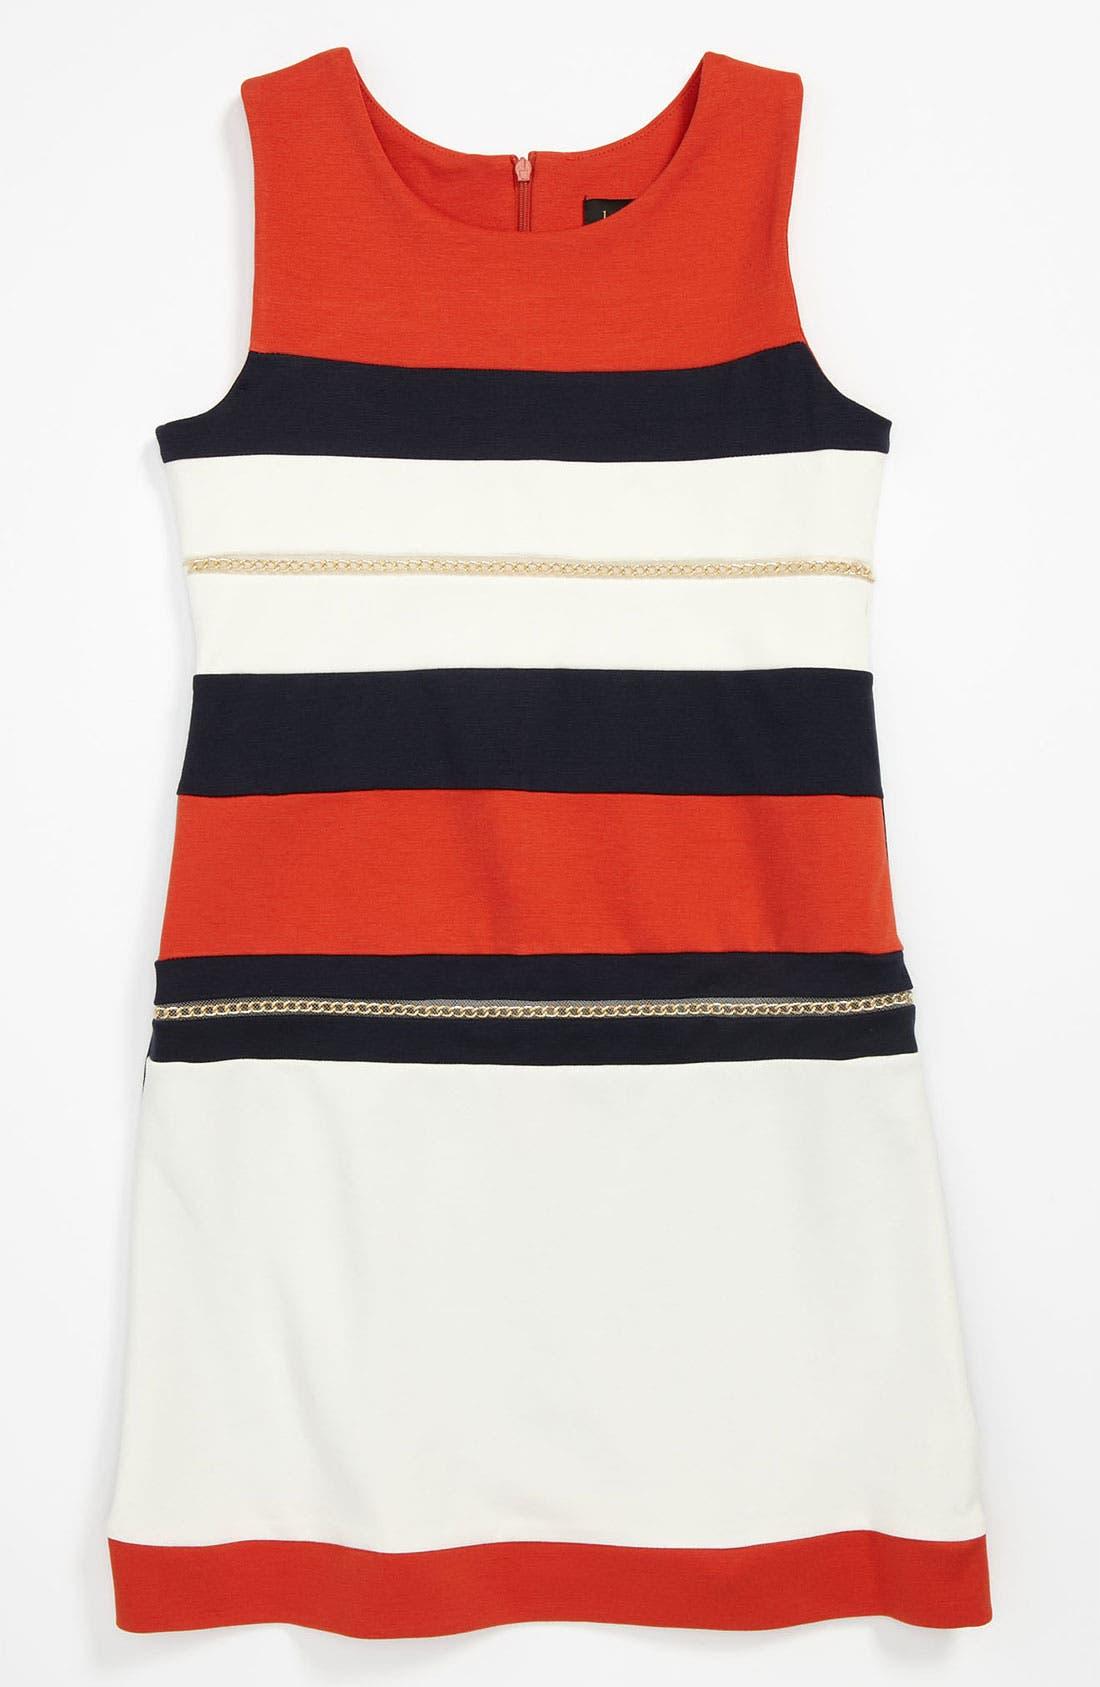 Alternate Image 1 Selected - Laundry by Shelli Segal 'Veronica' Dress (Big Girls)